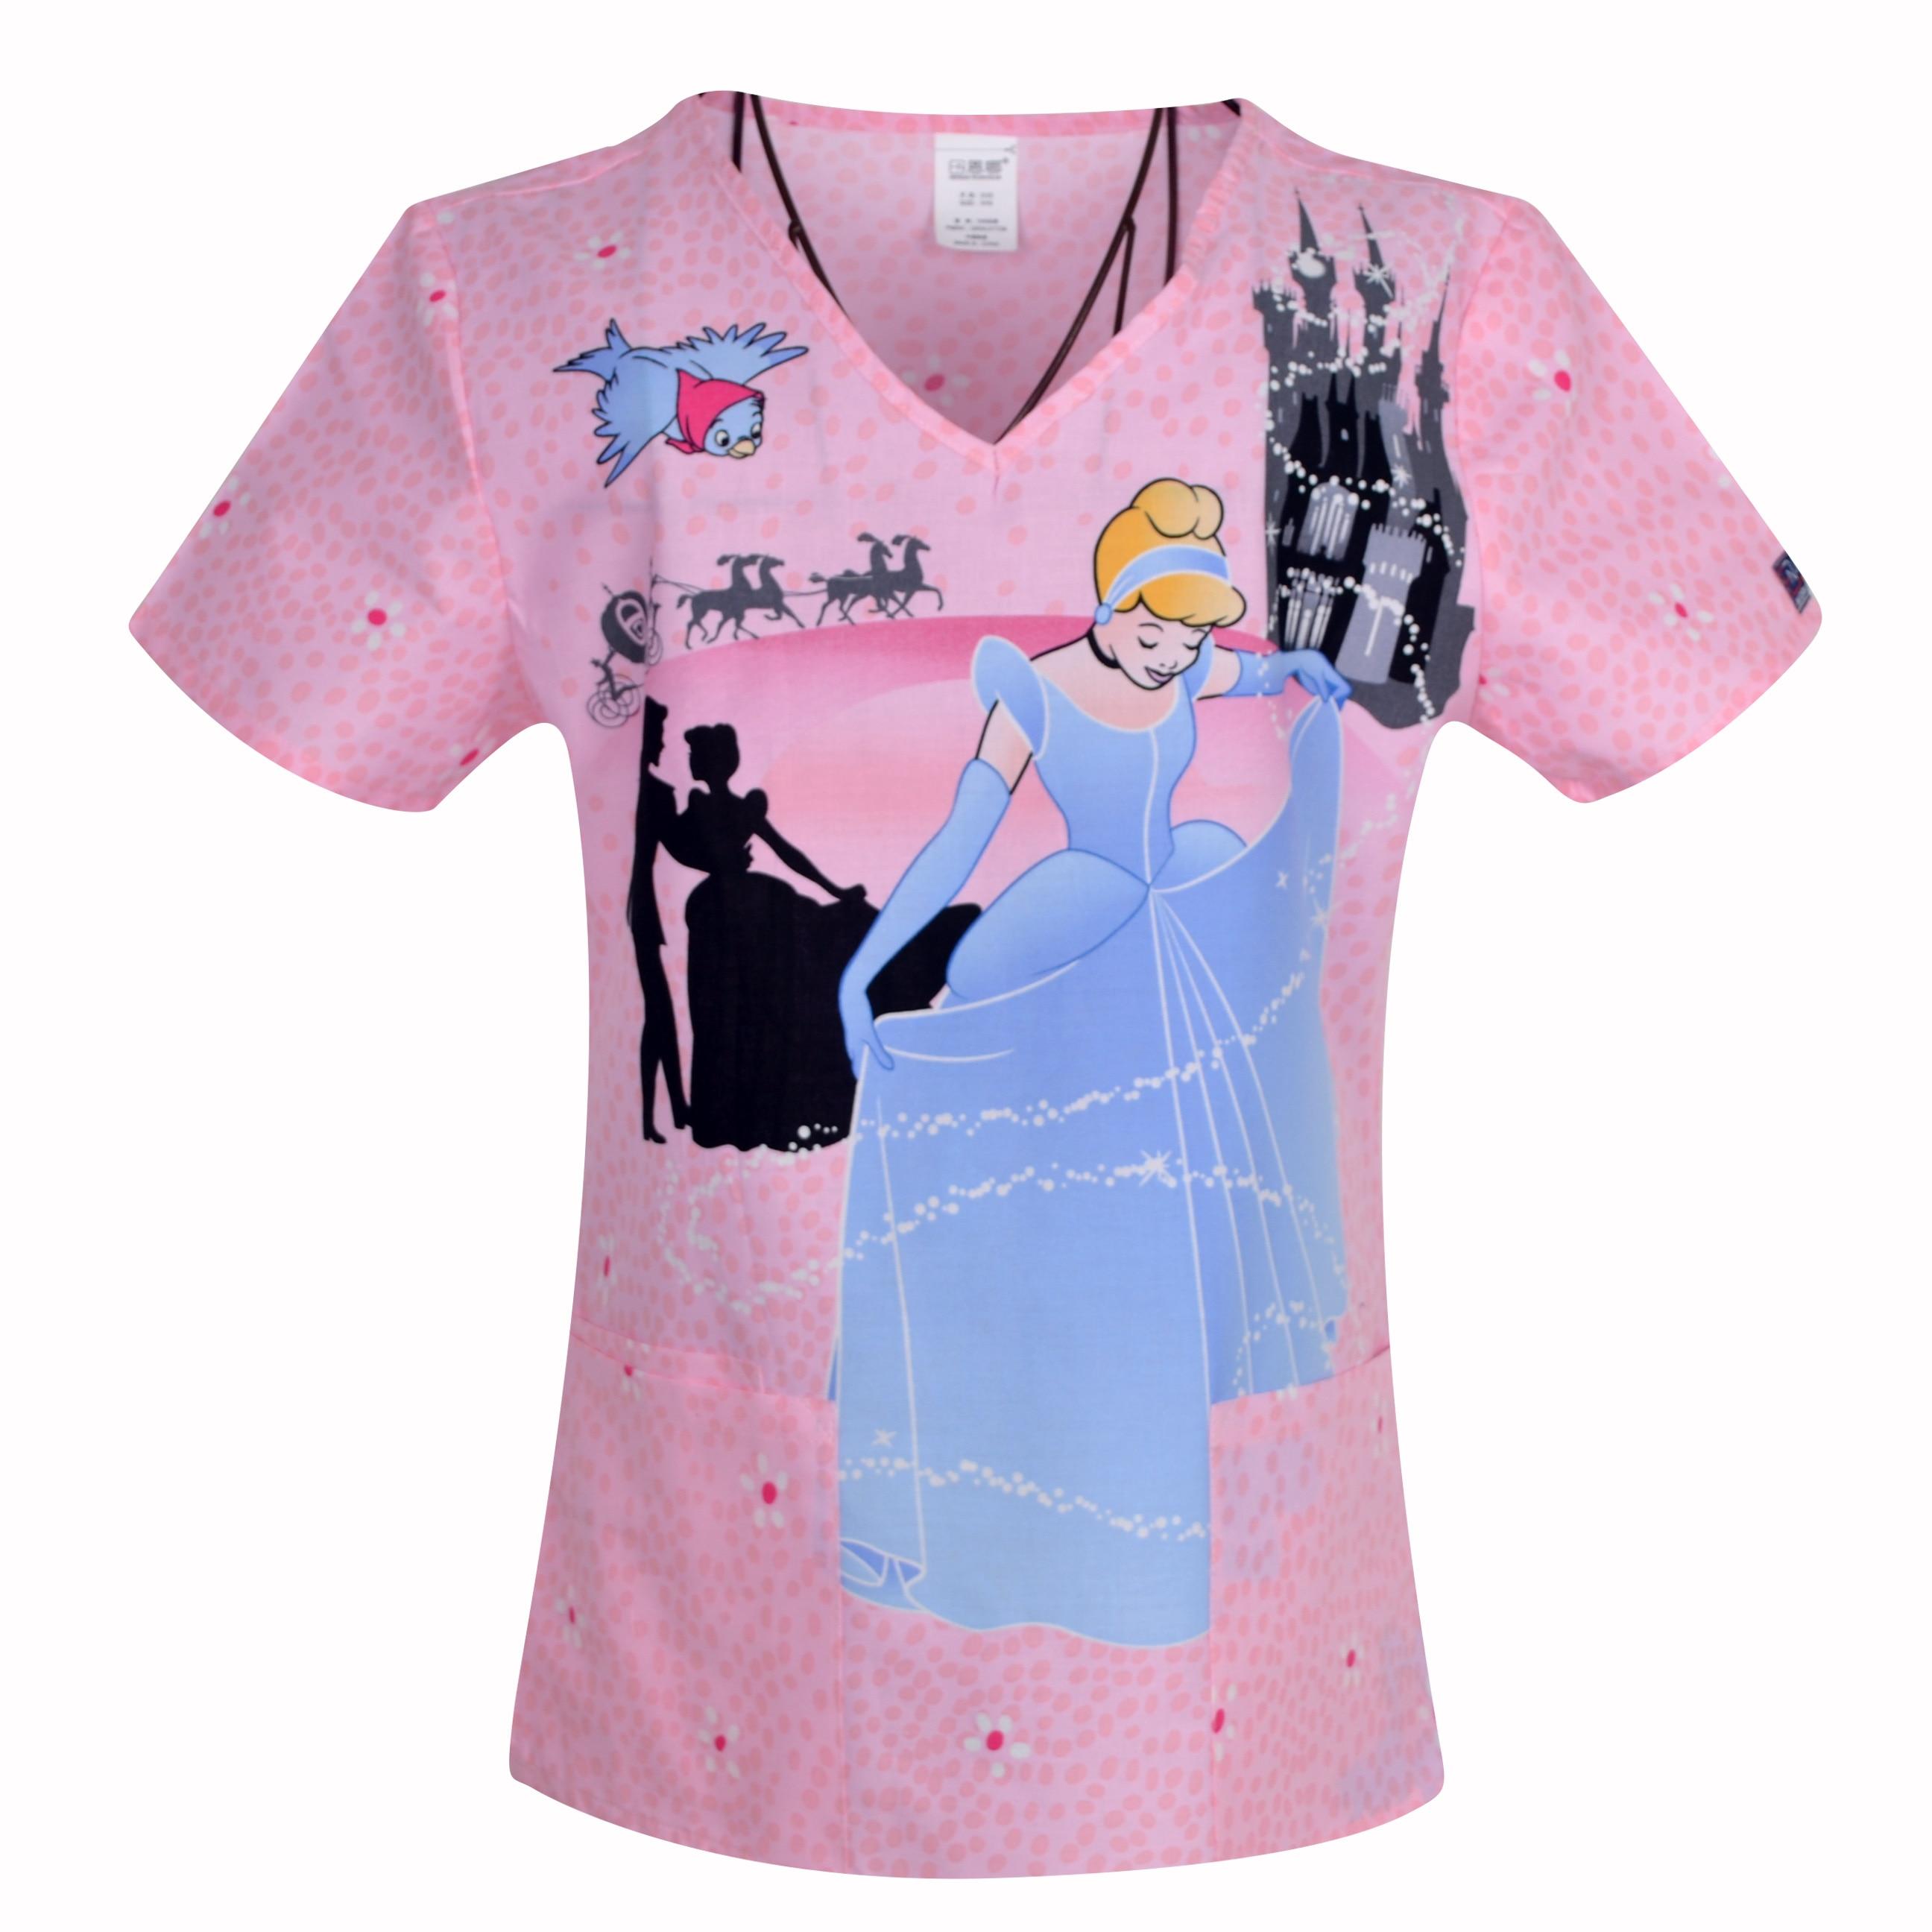 Brand Heart Neck, Medical Scrub Tops Surgical Scrubs,scrub Uniform 100% Print Cotton Medical Uniforms Engineered Print Piece Cut